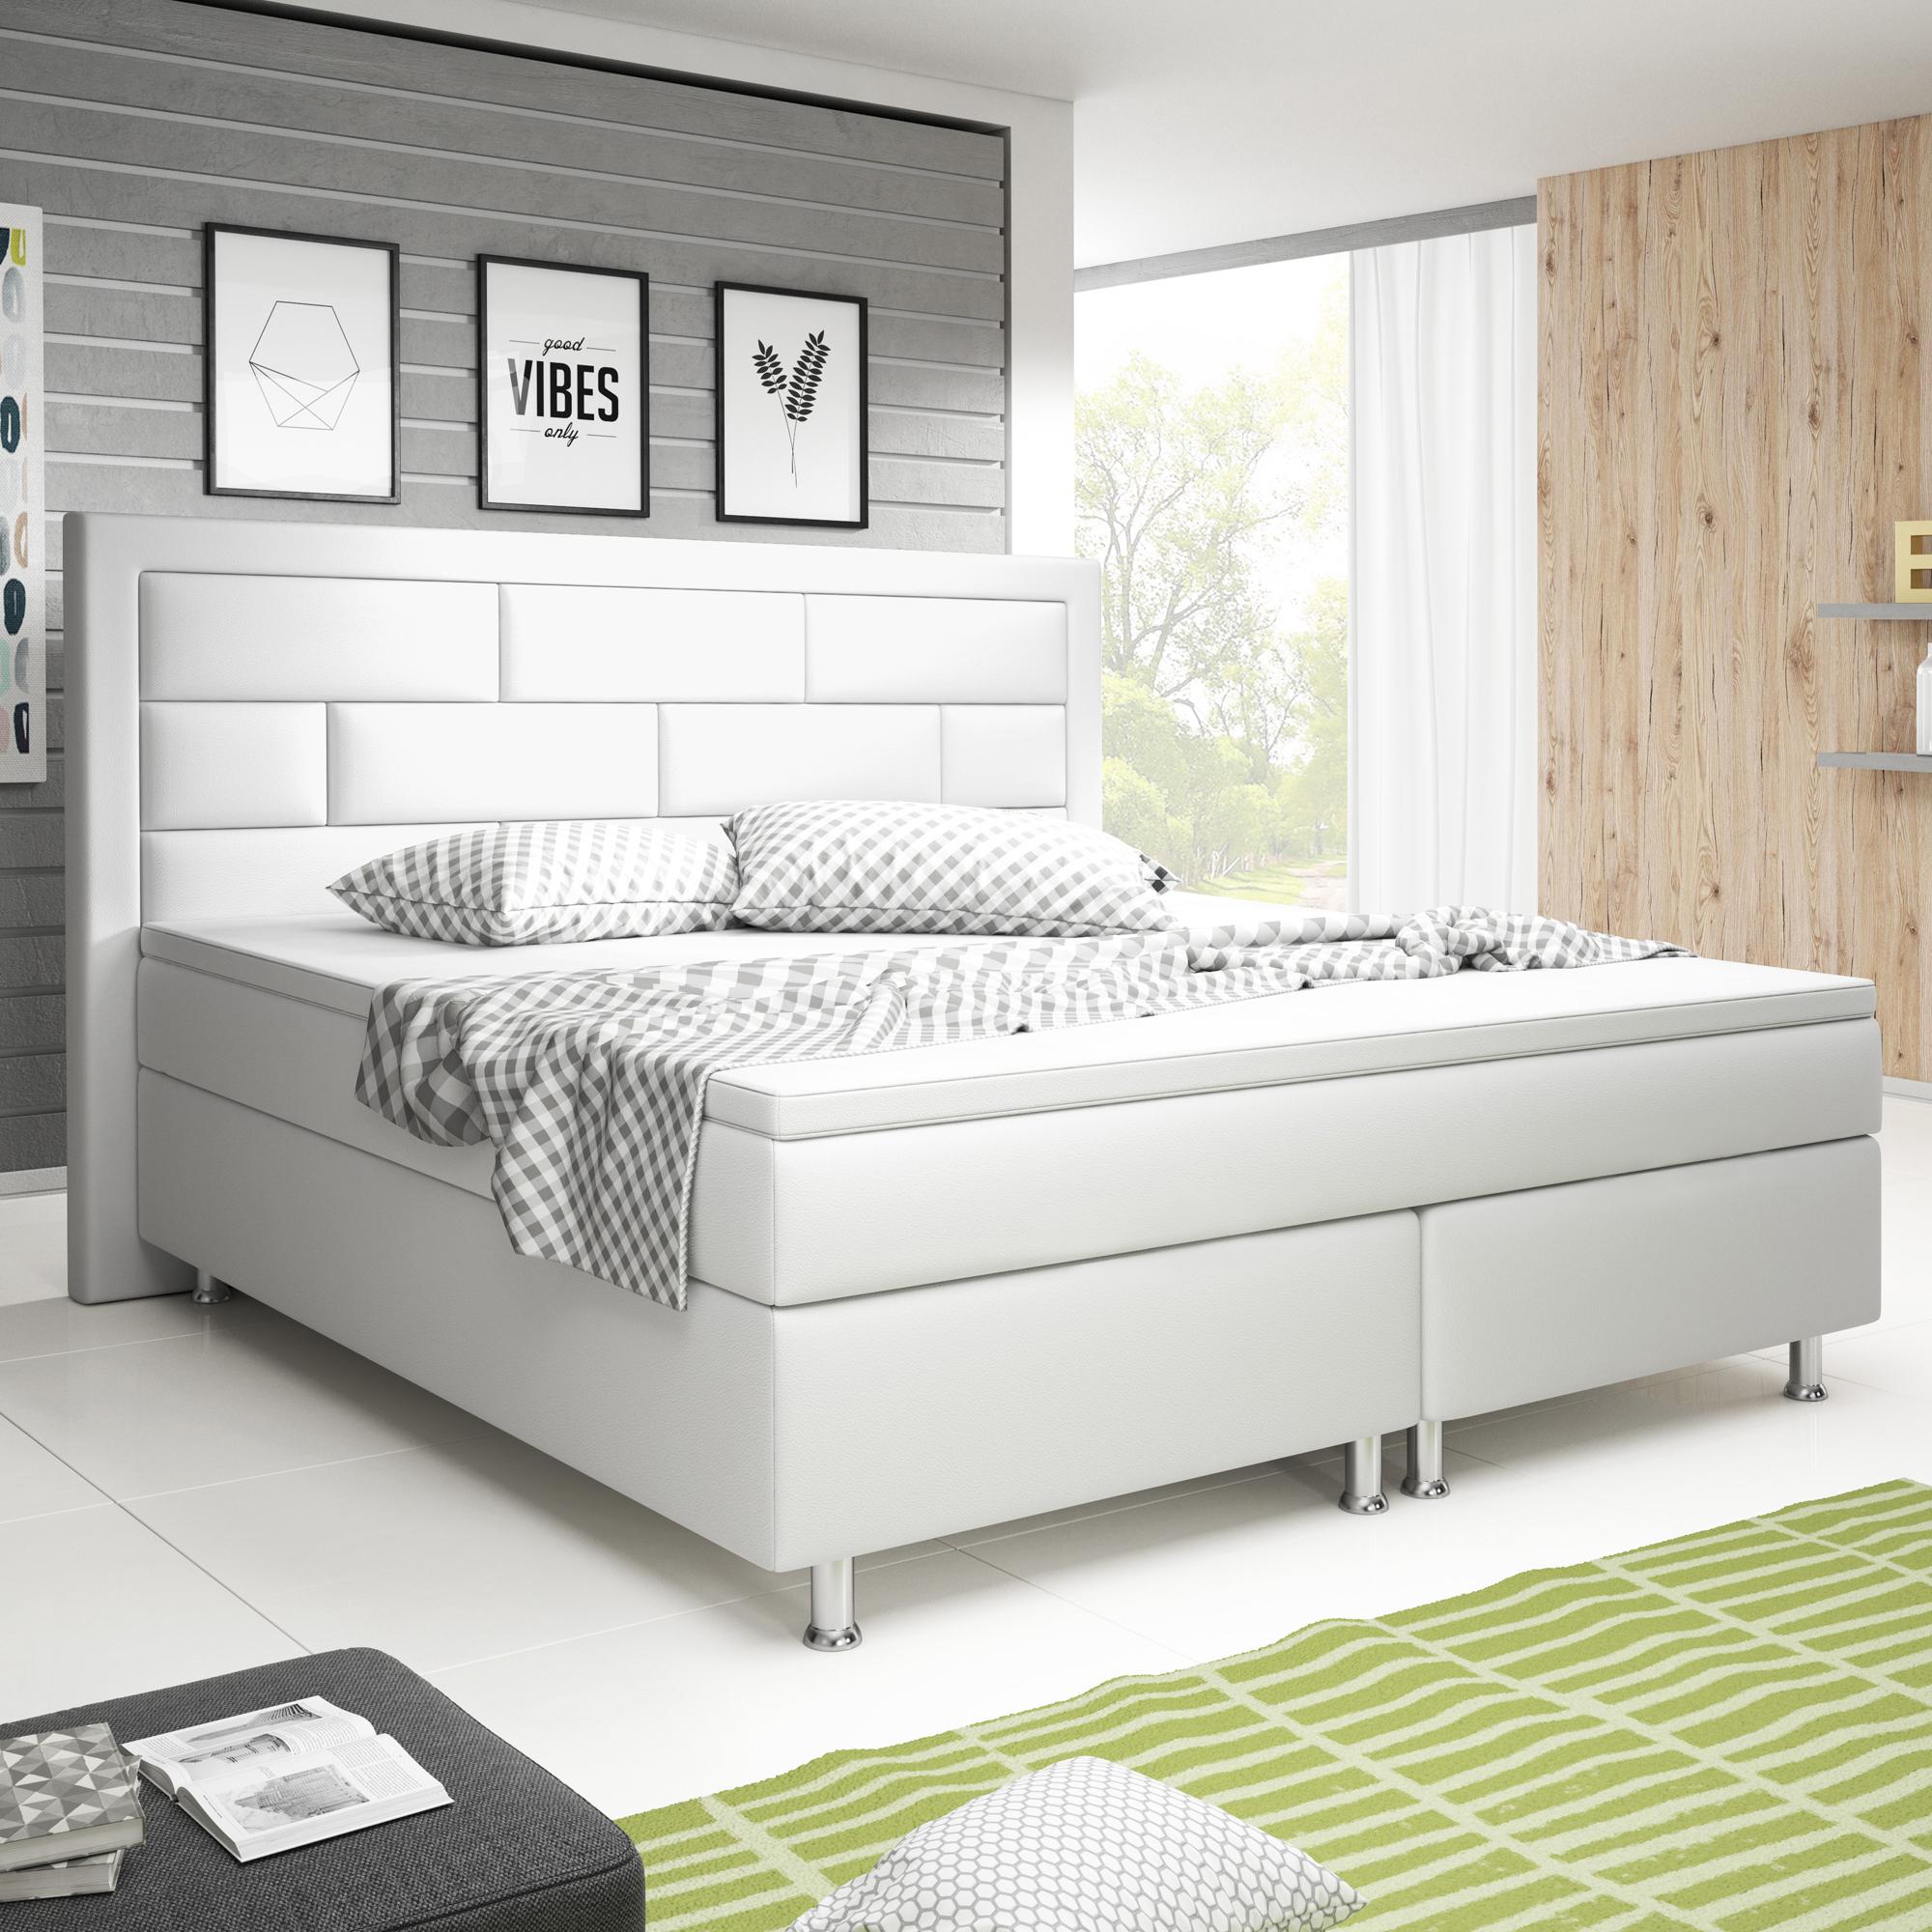 boxspringbett nizza 180x200 cm kunstleder wei schlafen. Black Bedroom Furniture Sets. Home Design Ideas